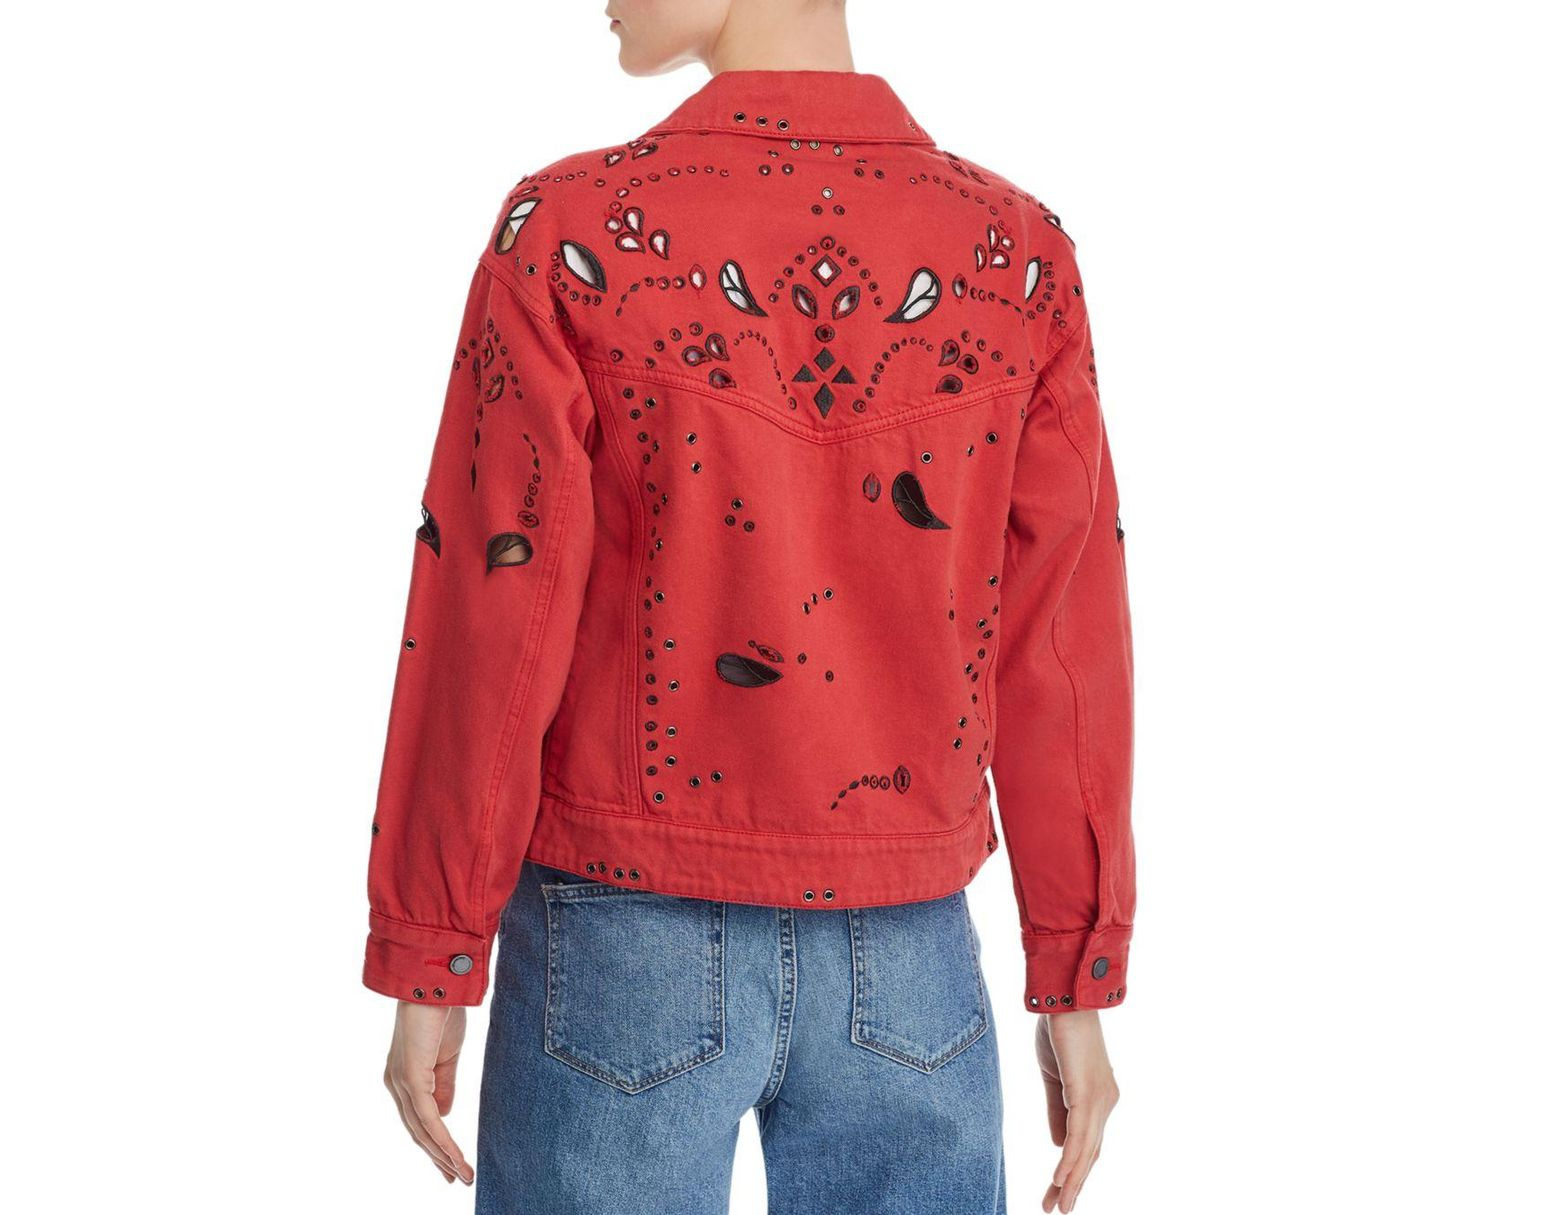 Women's Red Bandana Cropped Denim Jacket